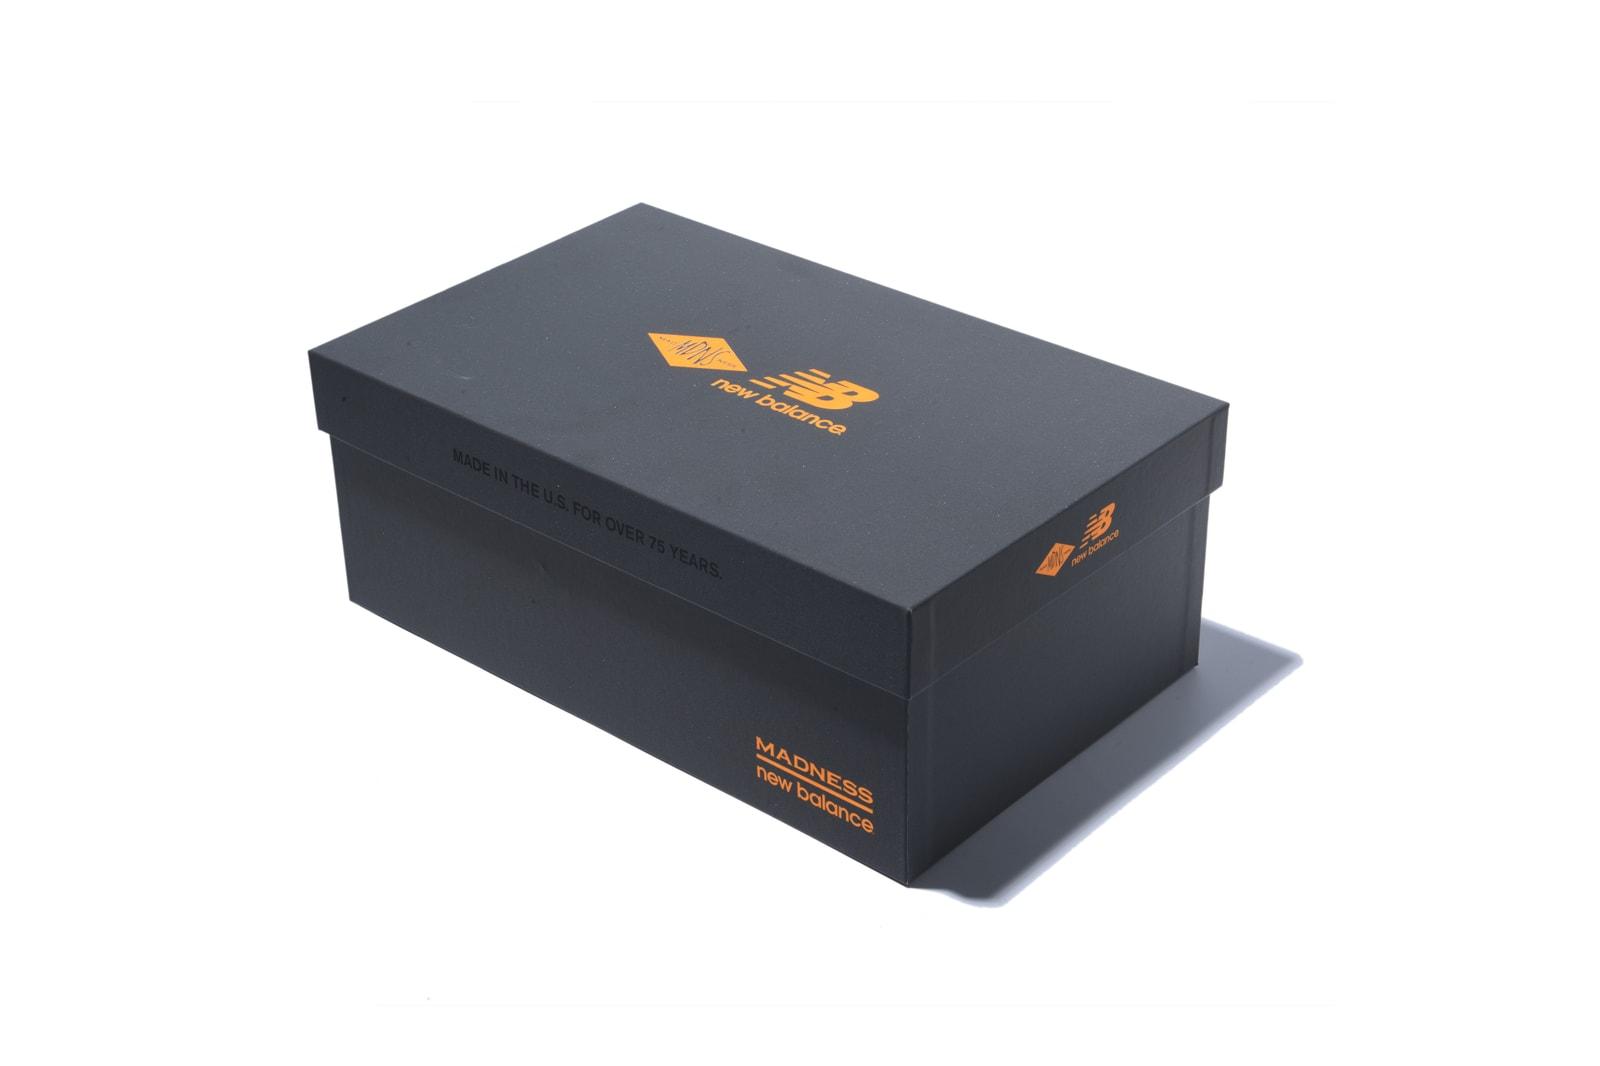 MADNESS x New Balance 聯乘企劃發售詳情正式公佈